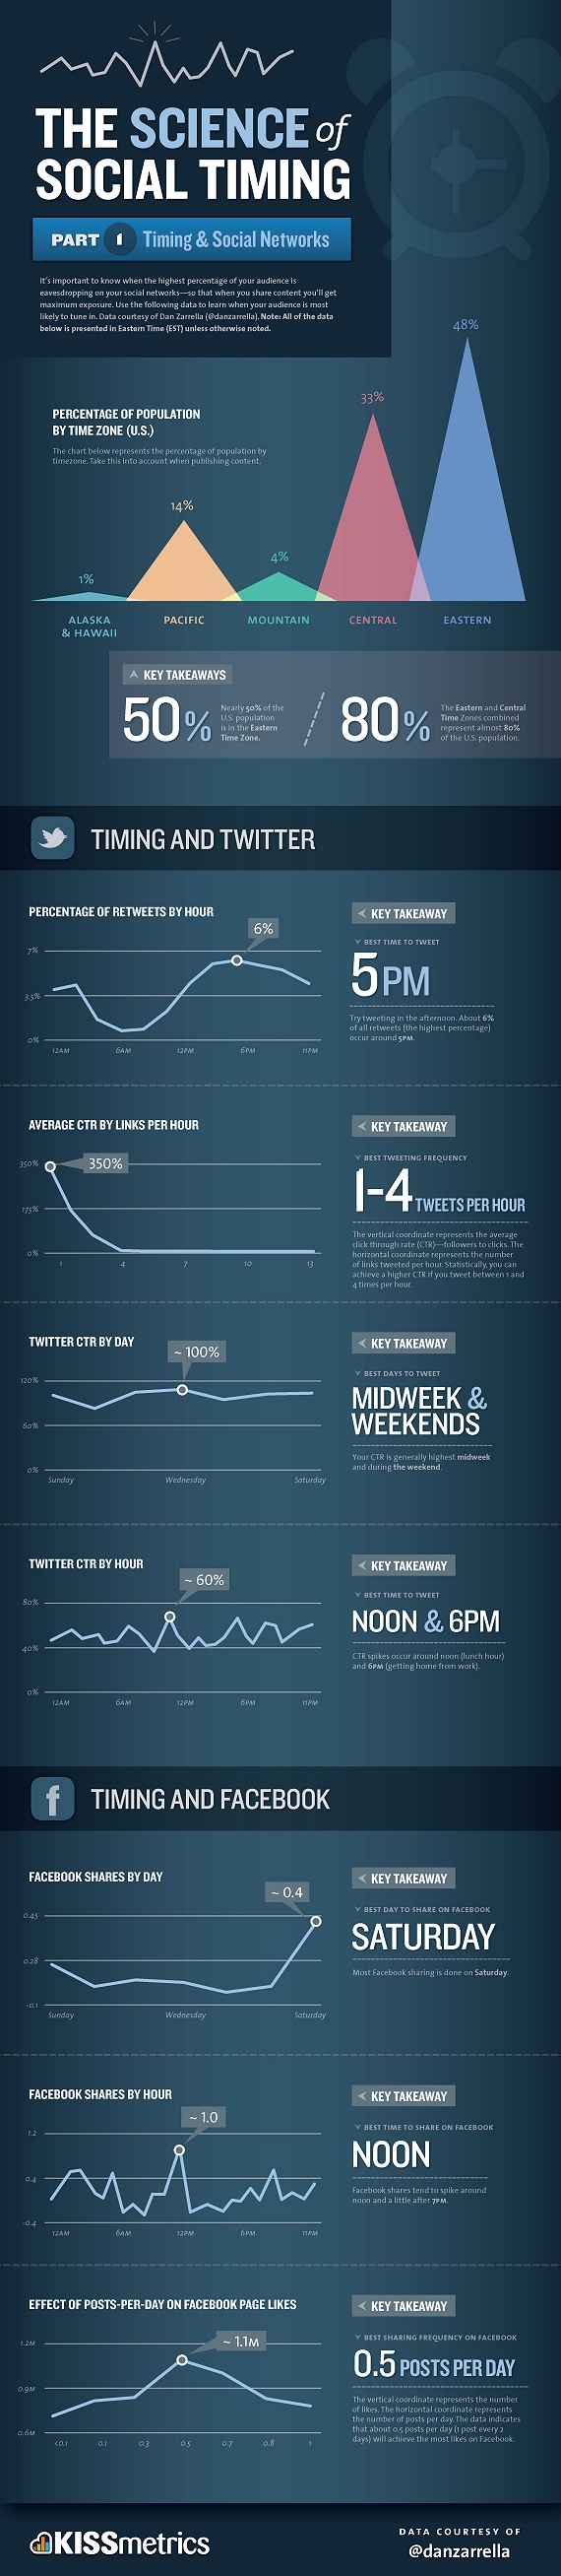 science of social timing social networks